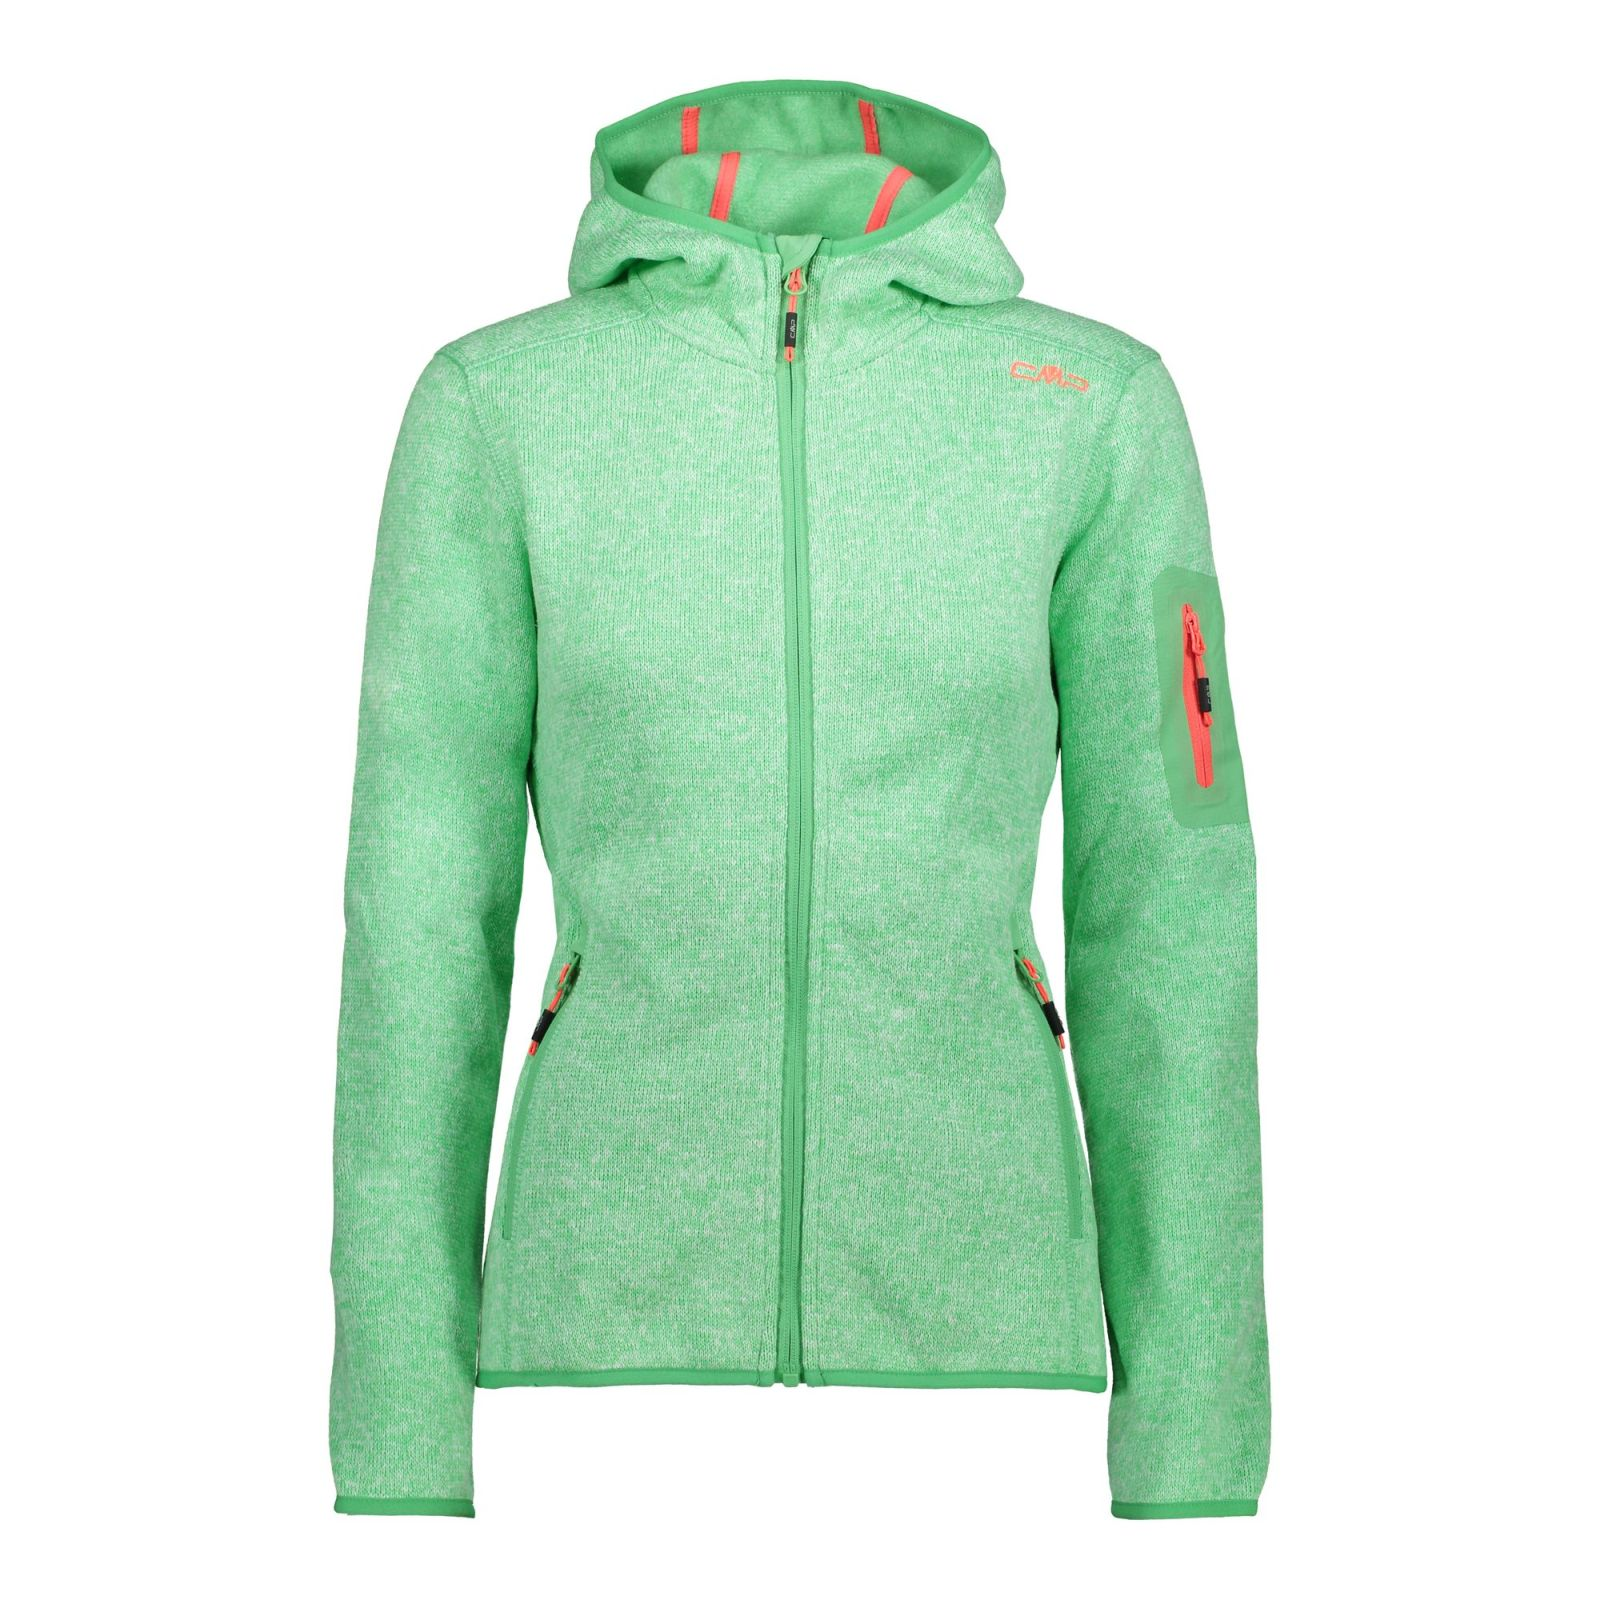 Details CMP Kapuze Freizeit Damen Fleece Campagnolo grün mel zu Hoody LLI Wander Jacke F m0wNn8